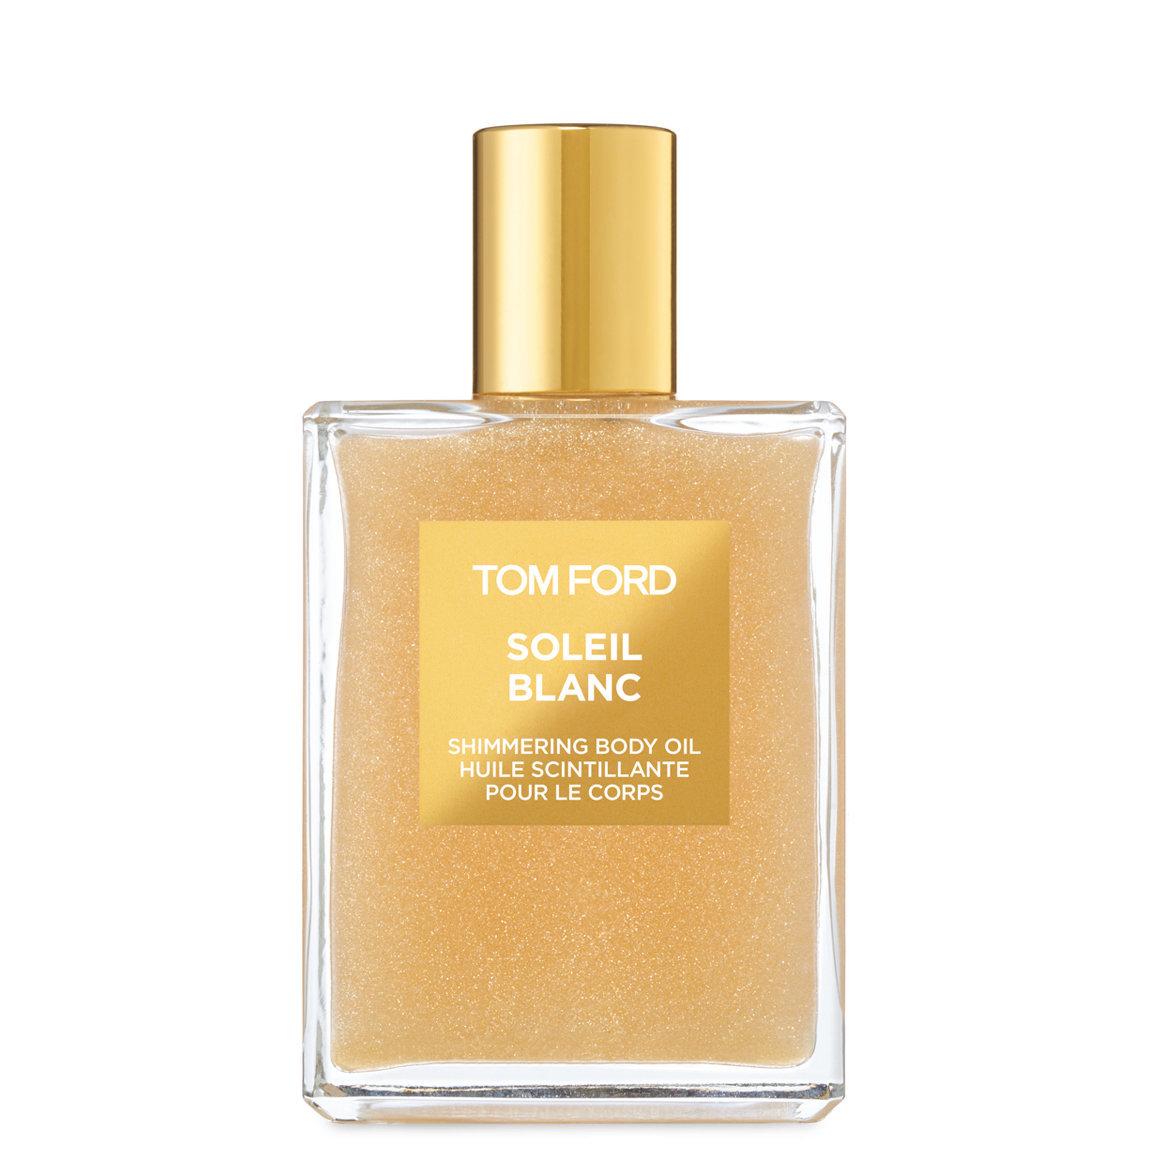 TOM FORD Soleil Blanc Shimmering Body Oil Gold alternative view 1.